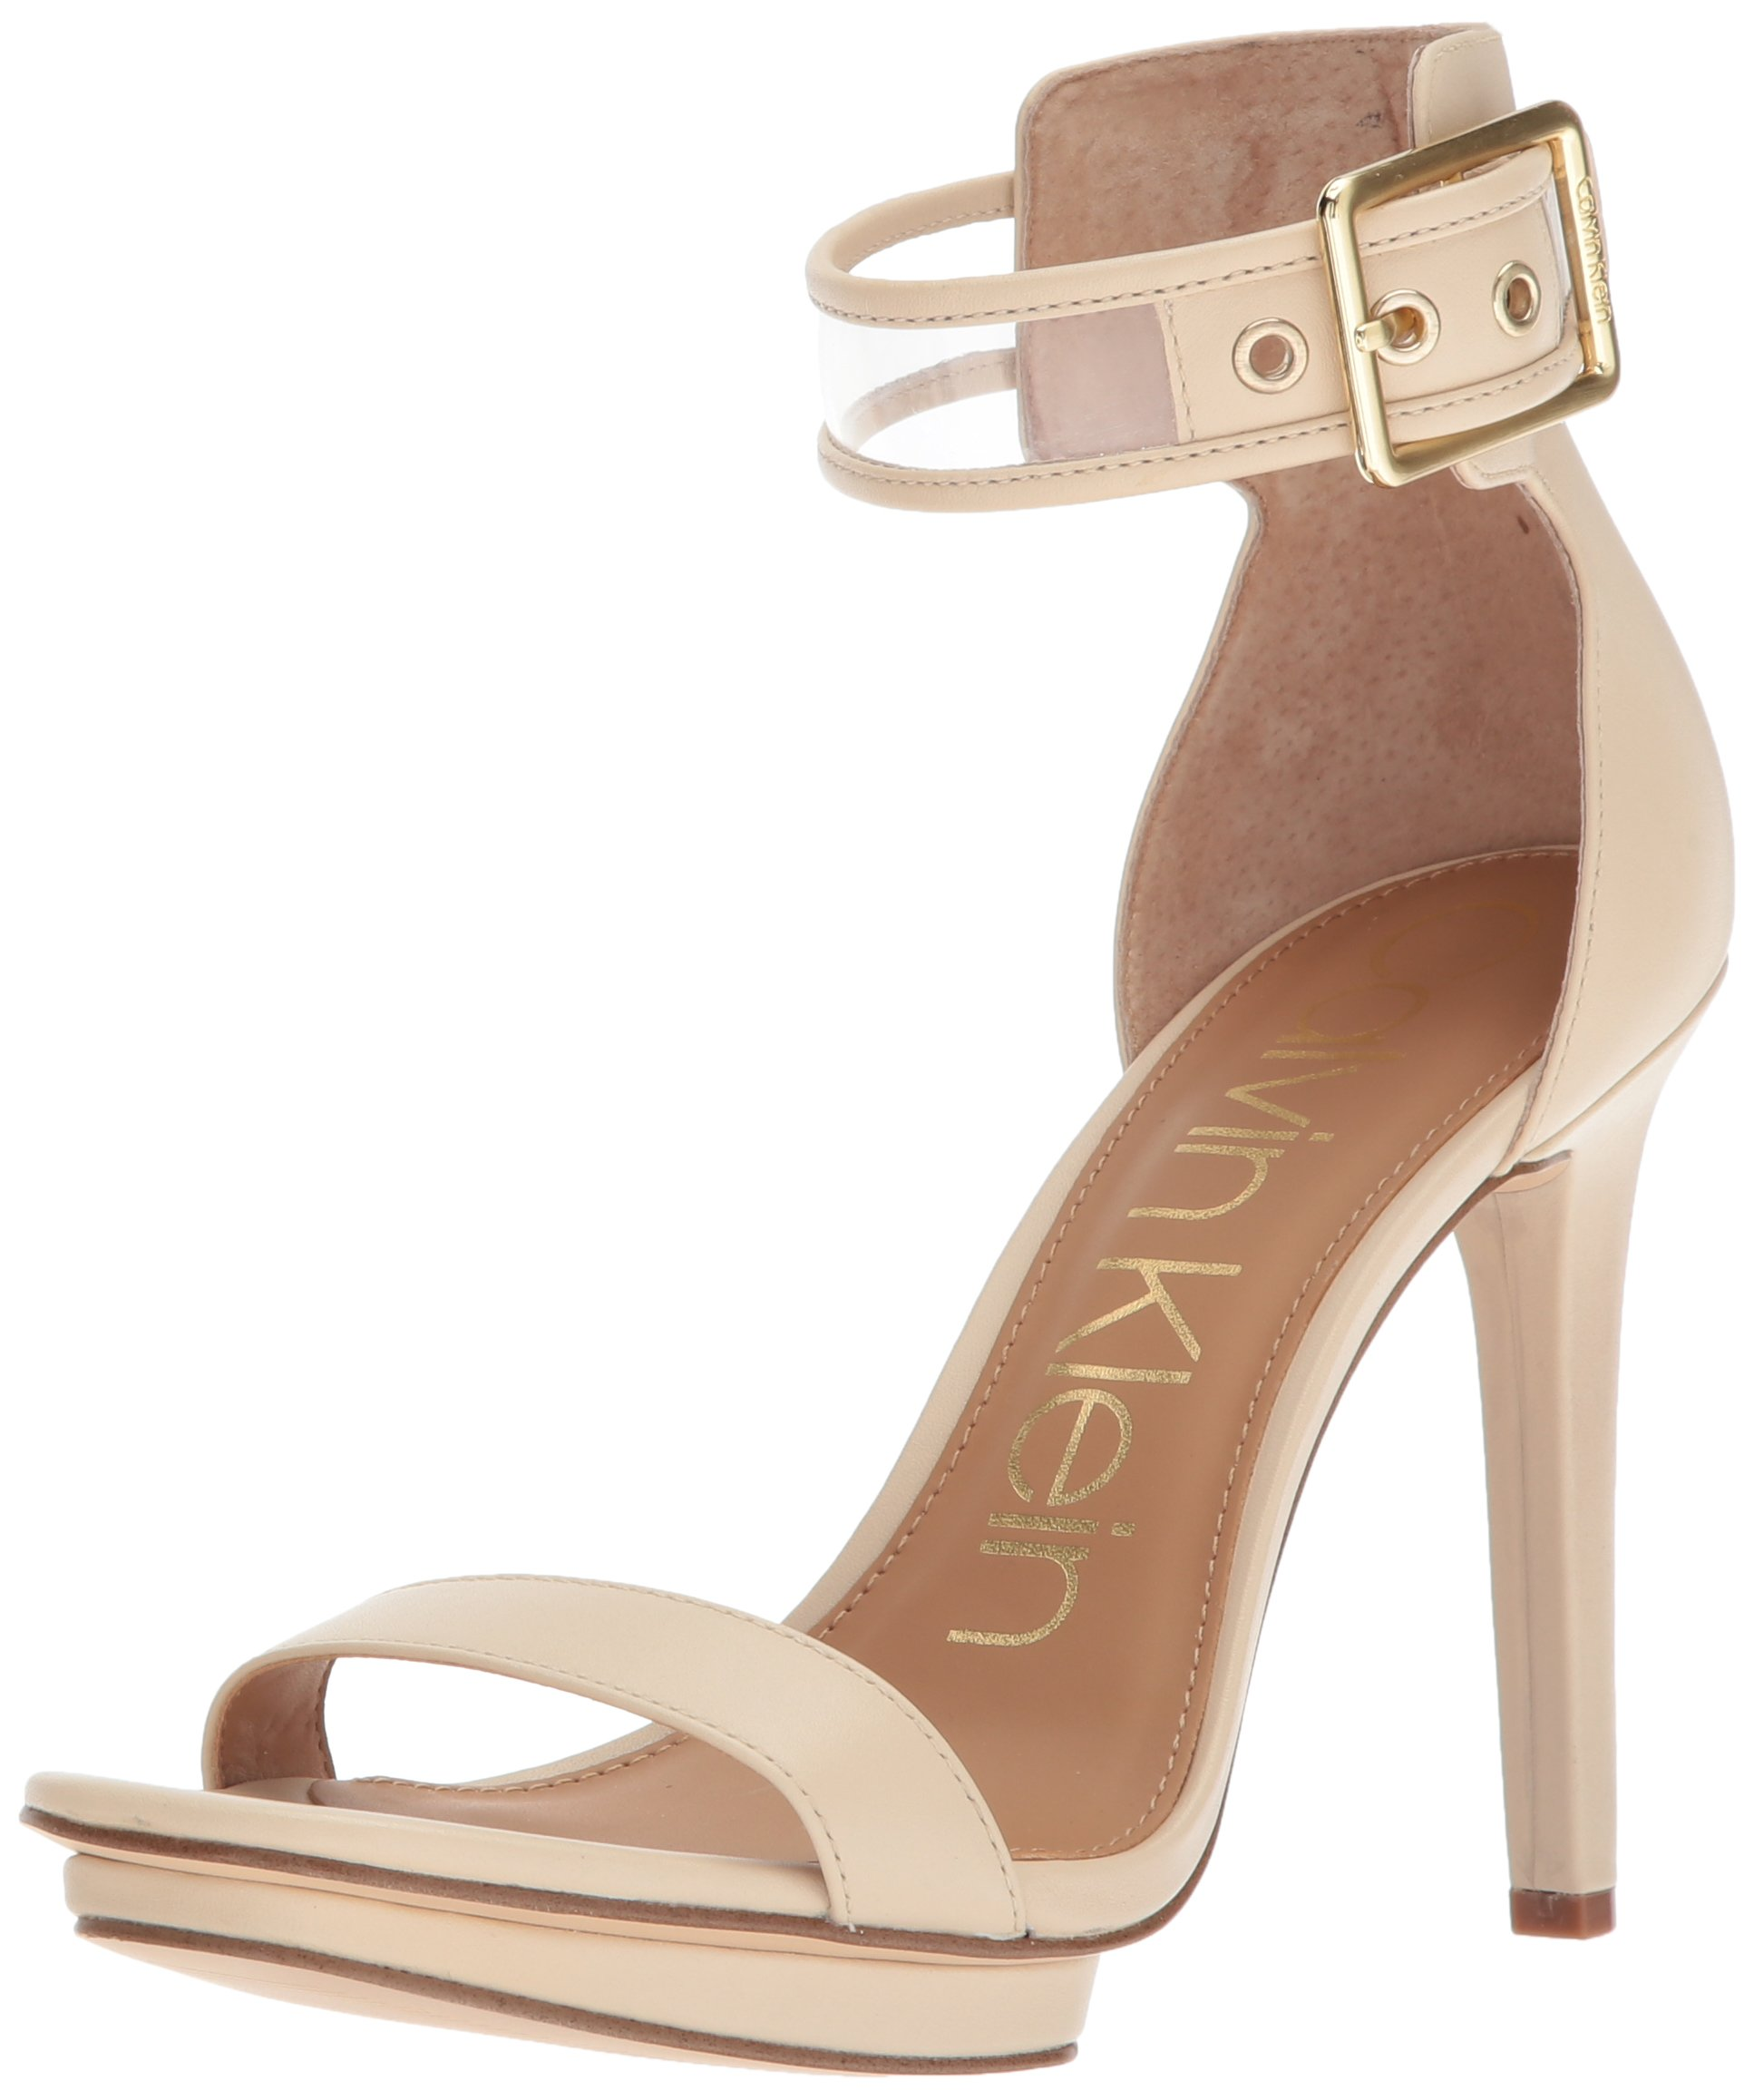 Calvin Klein Women's Vable Heeled Sandal, Sand, 6 Medium US